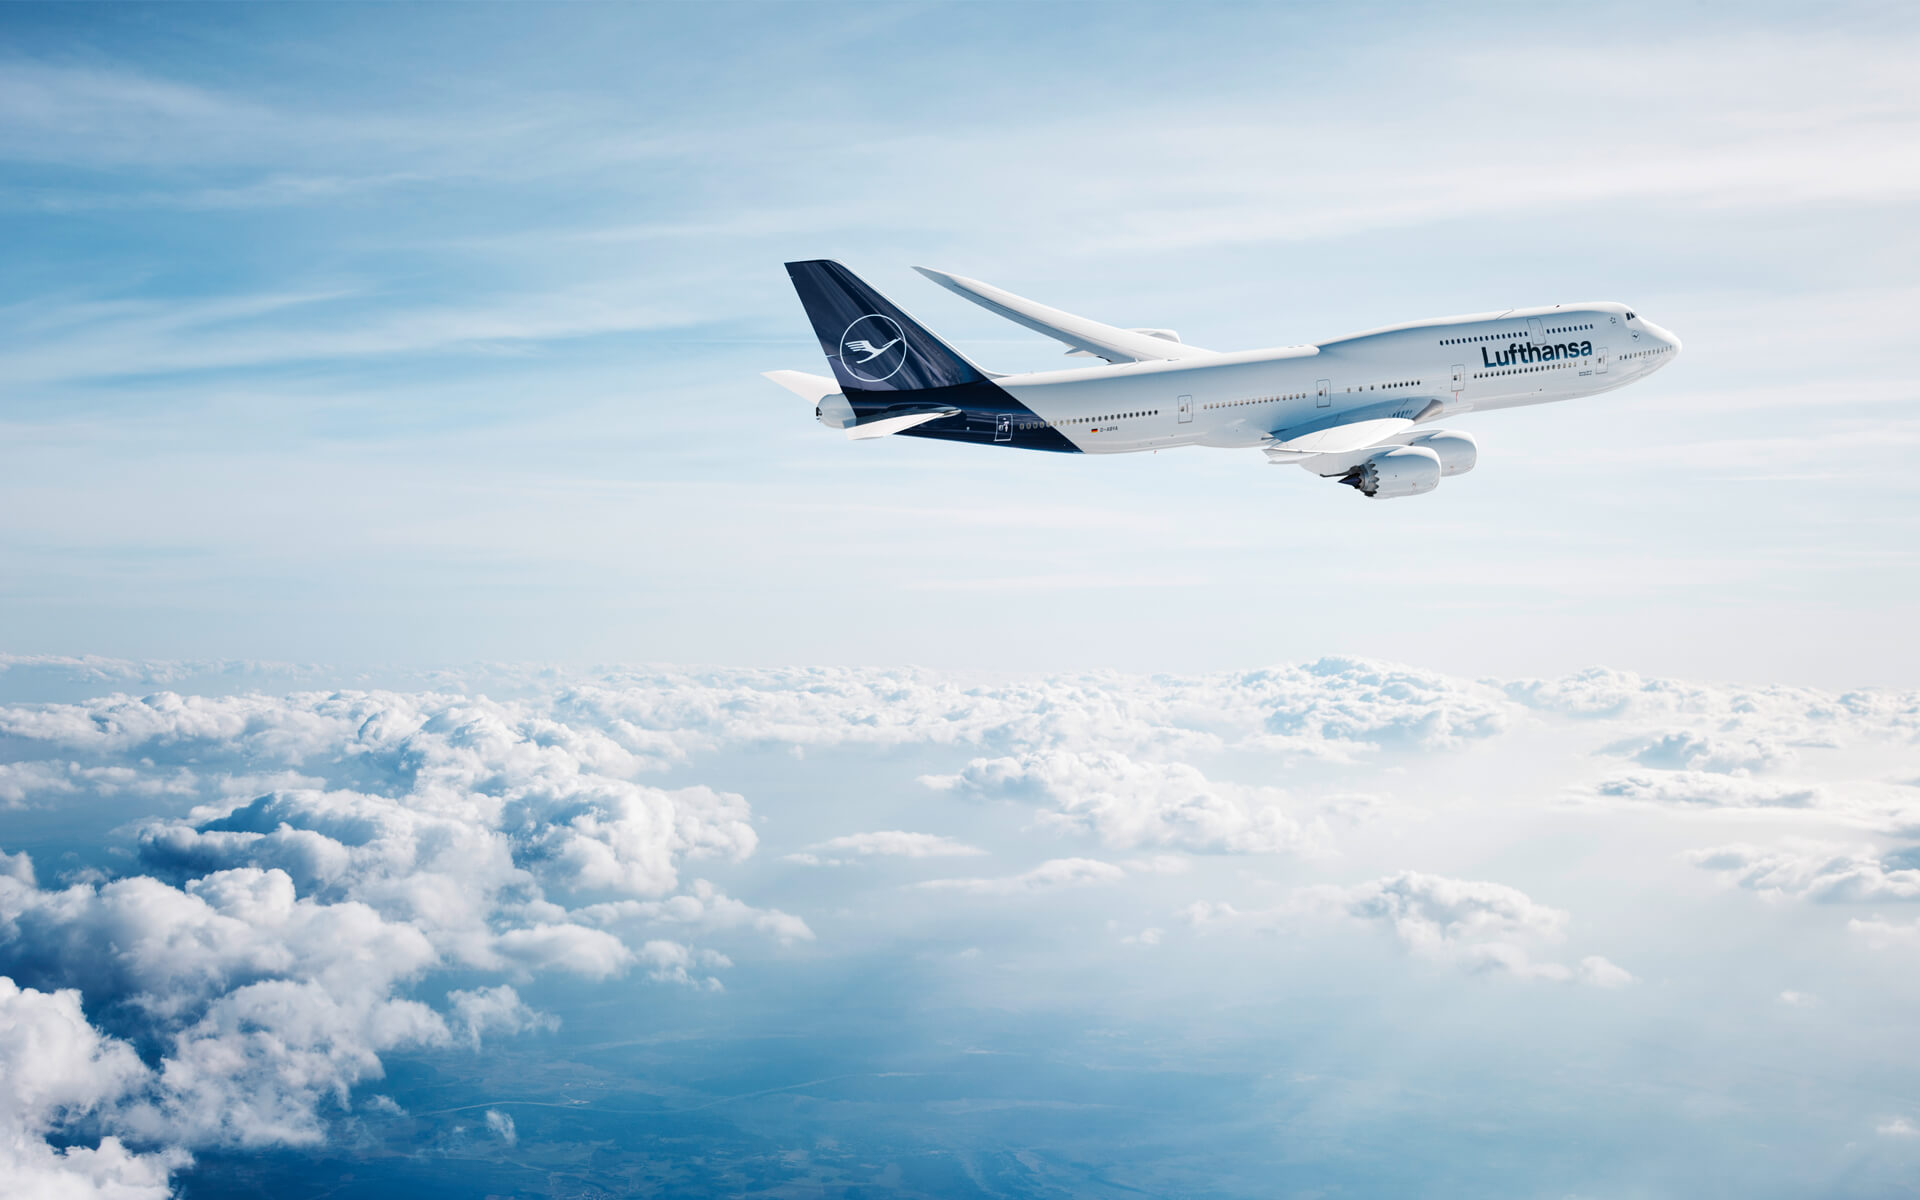 Lufthansa Corporate Design 2018, Redesign